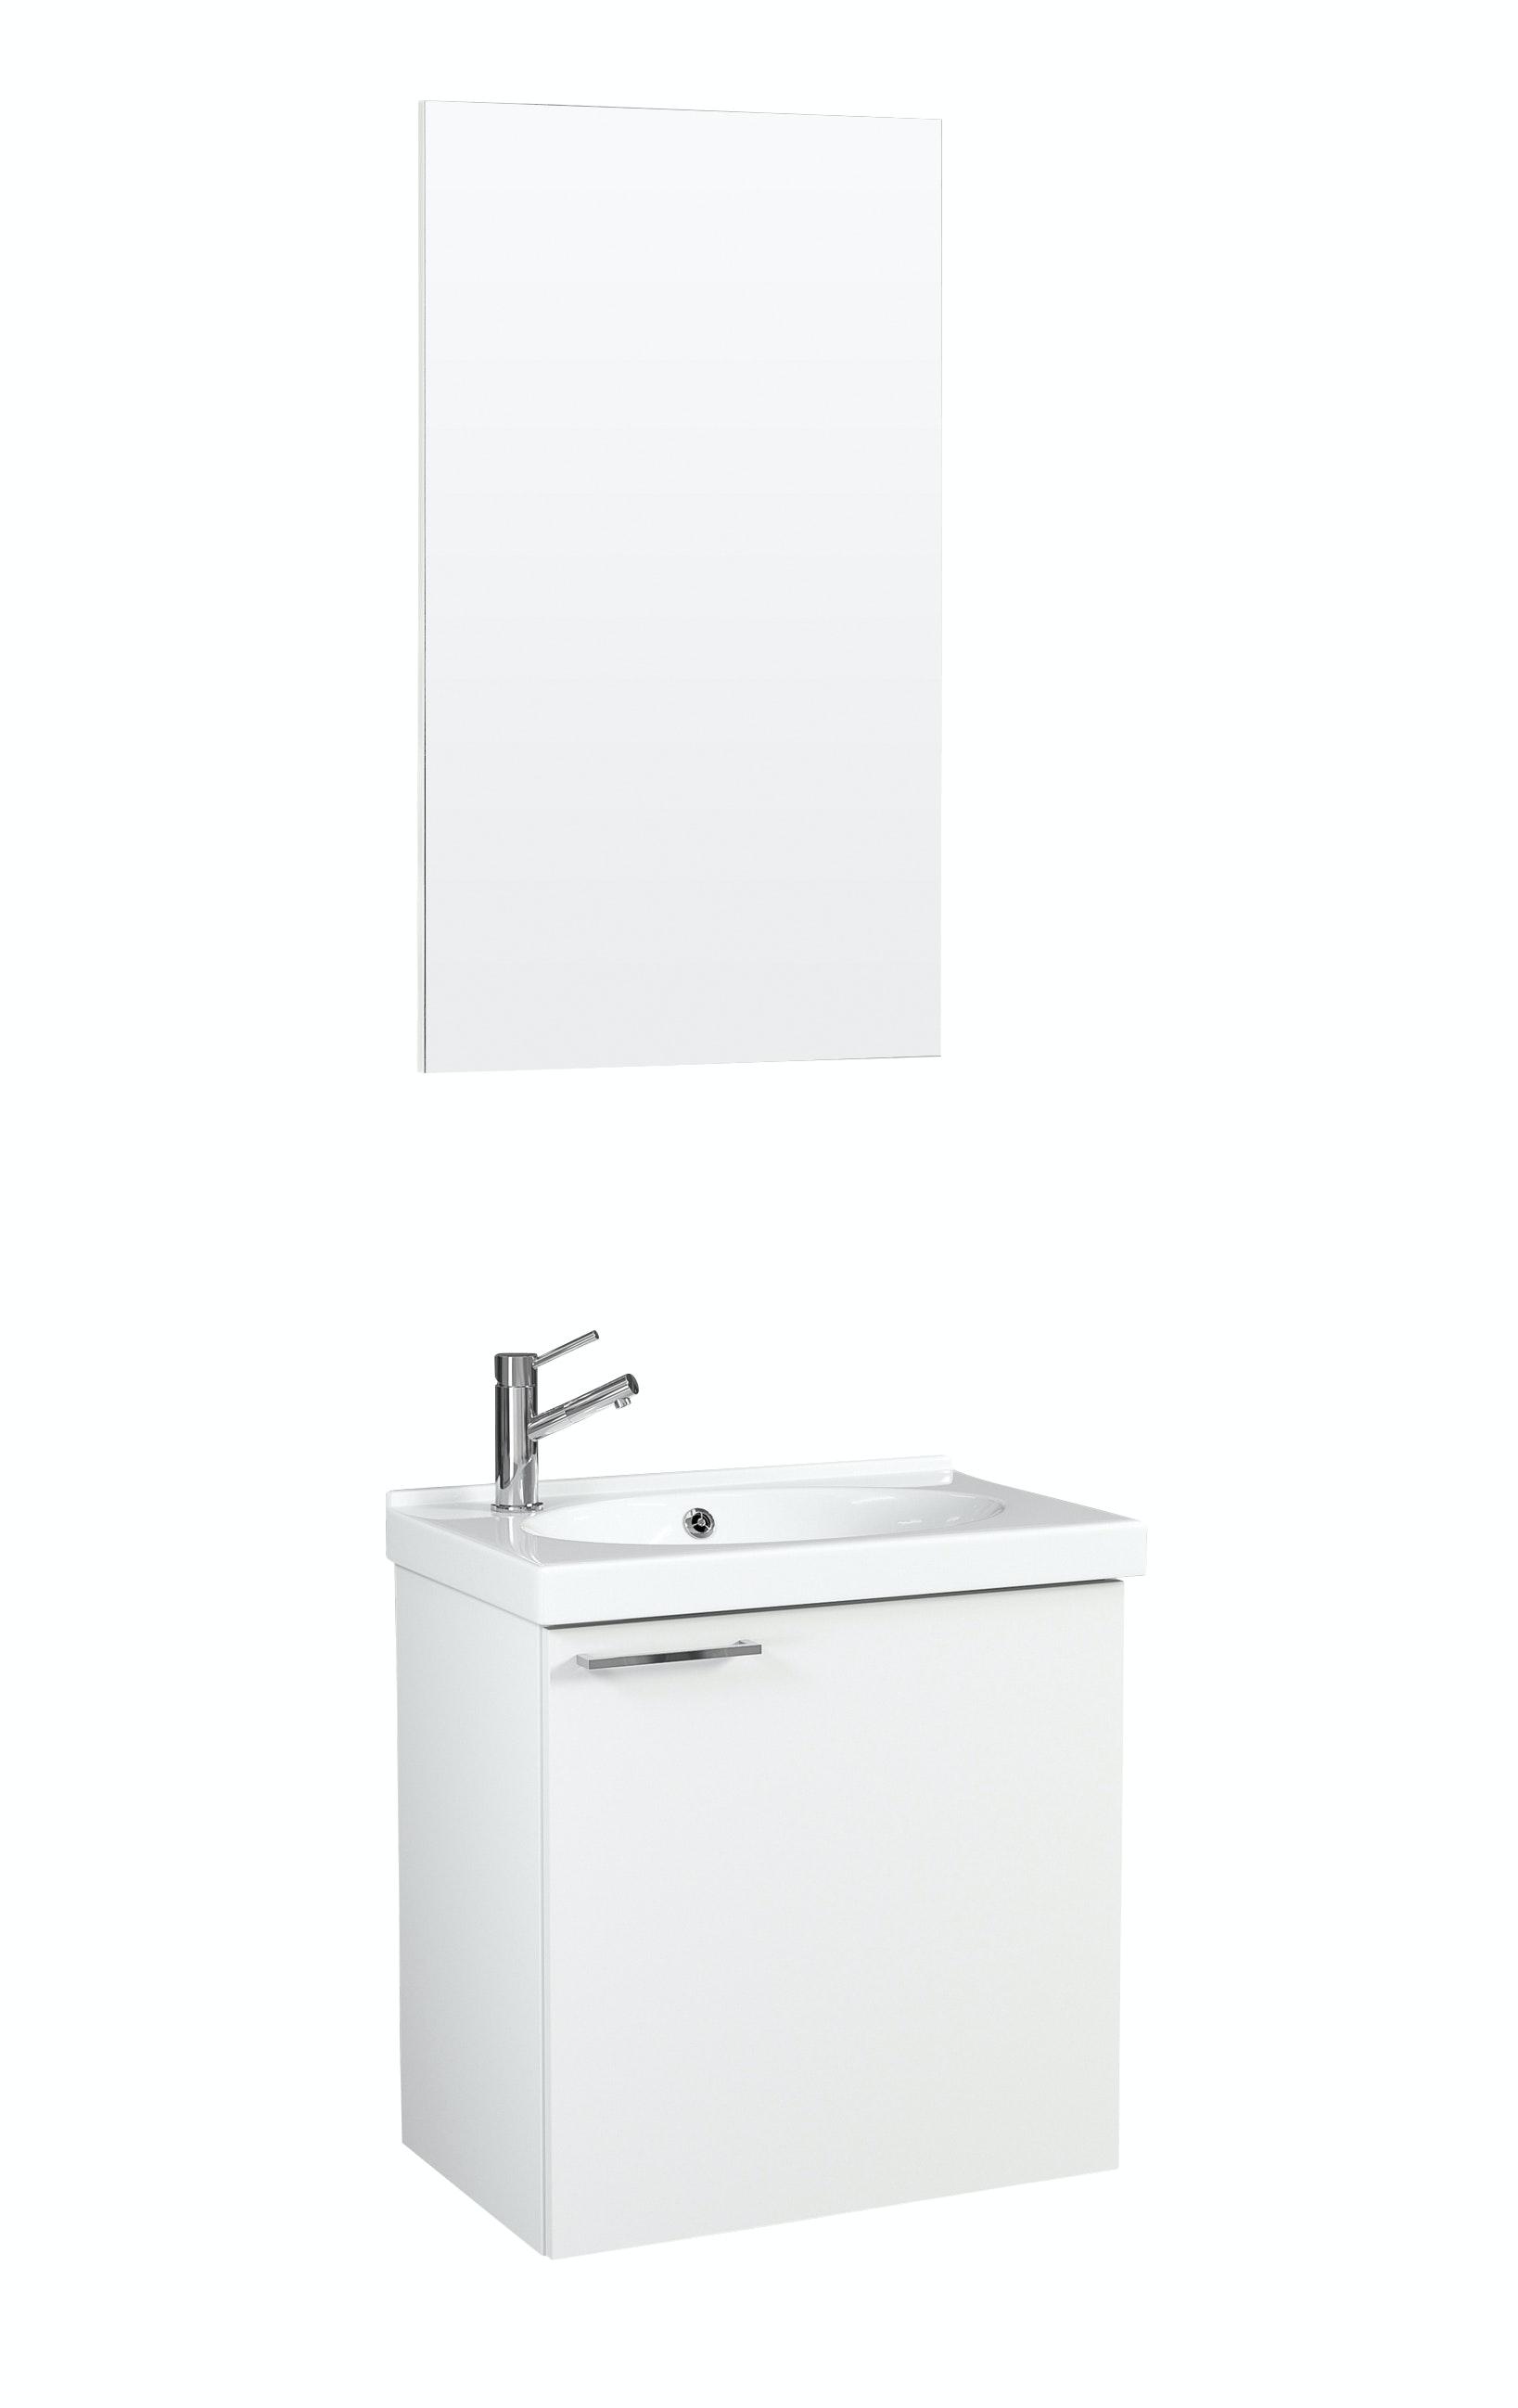 Möbelpaket Temal Trend 42X30 Vit Med Spegel